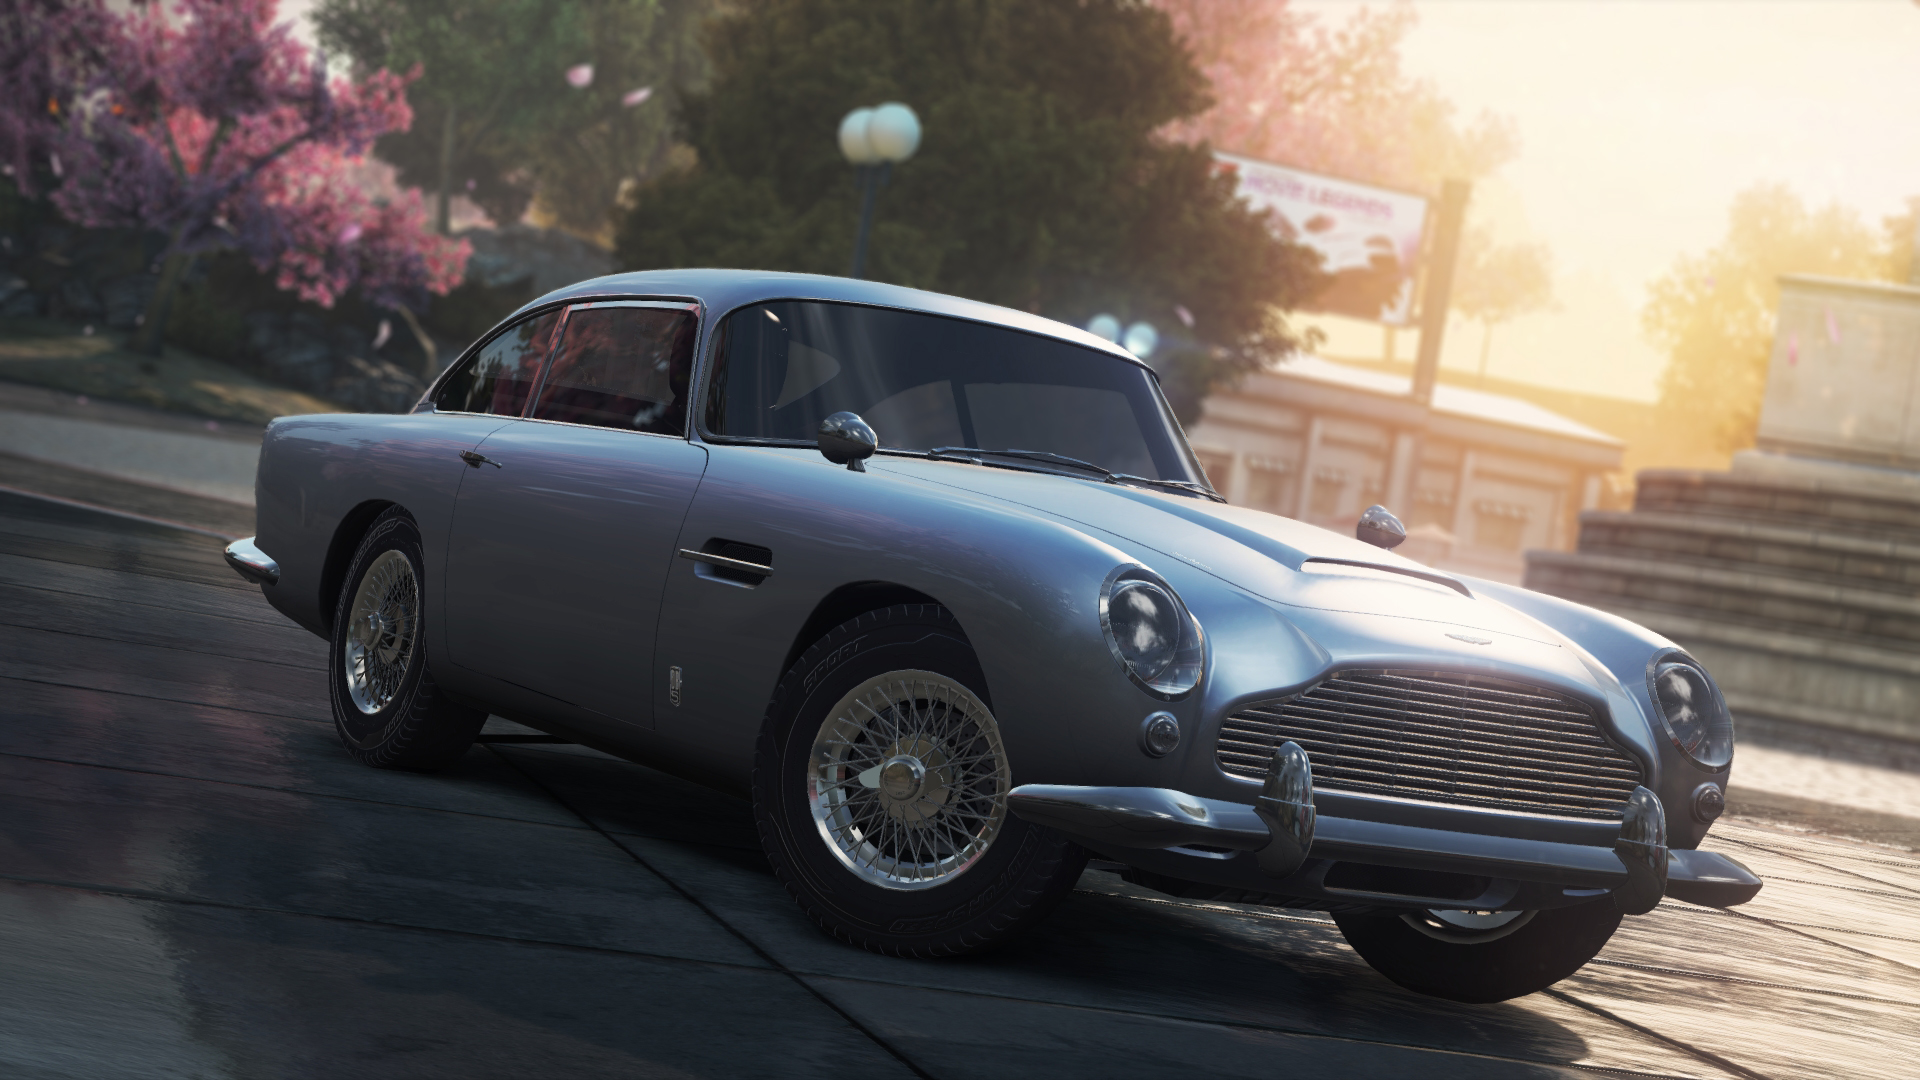 Aston Martin Db5 Vantage At The Need For Speed Wiki Need